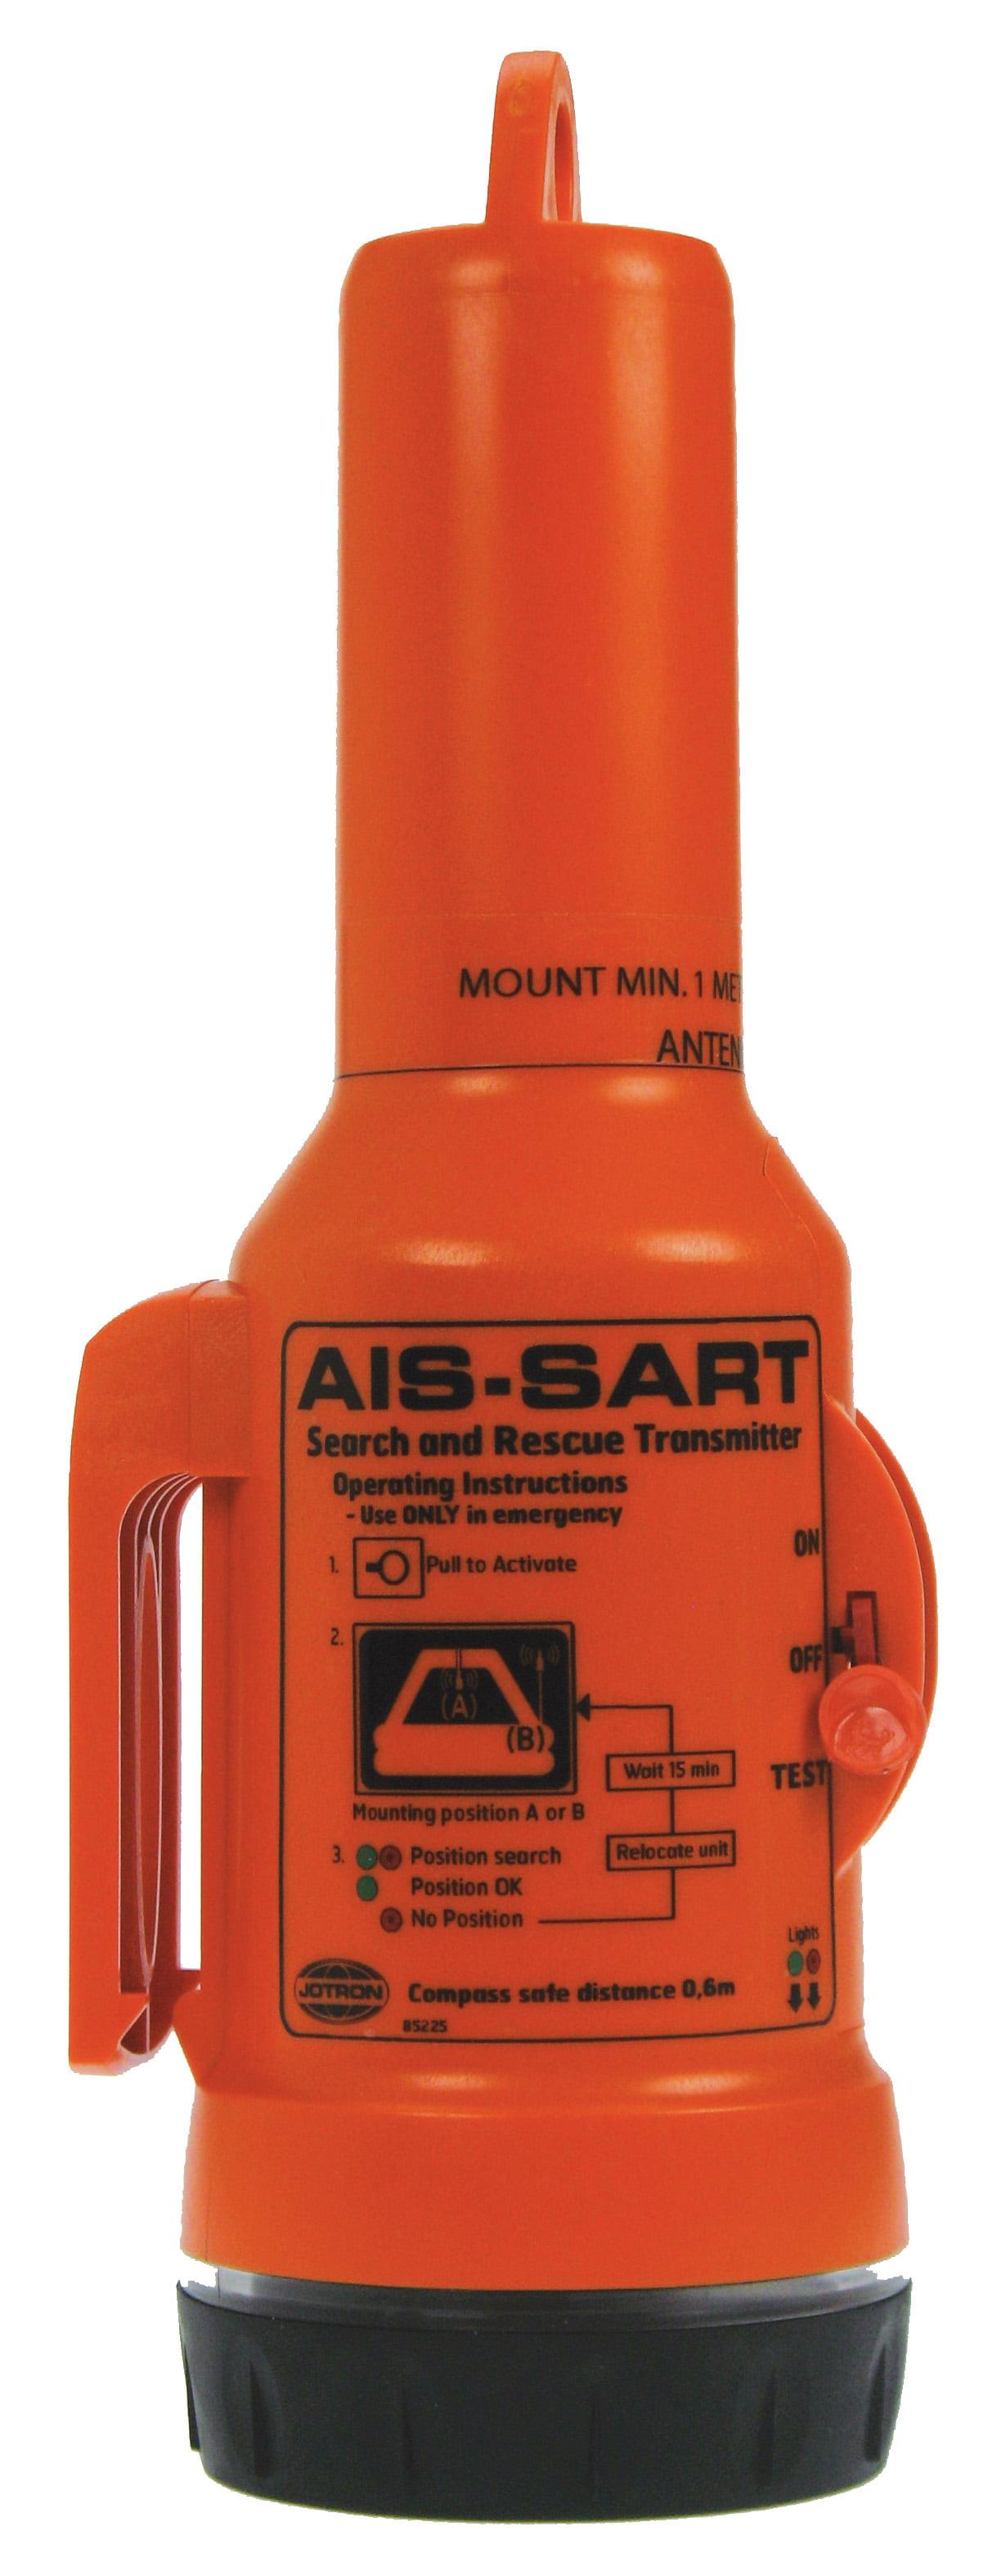 TRON AIS-SART-0